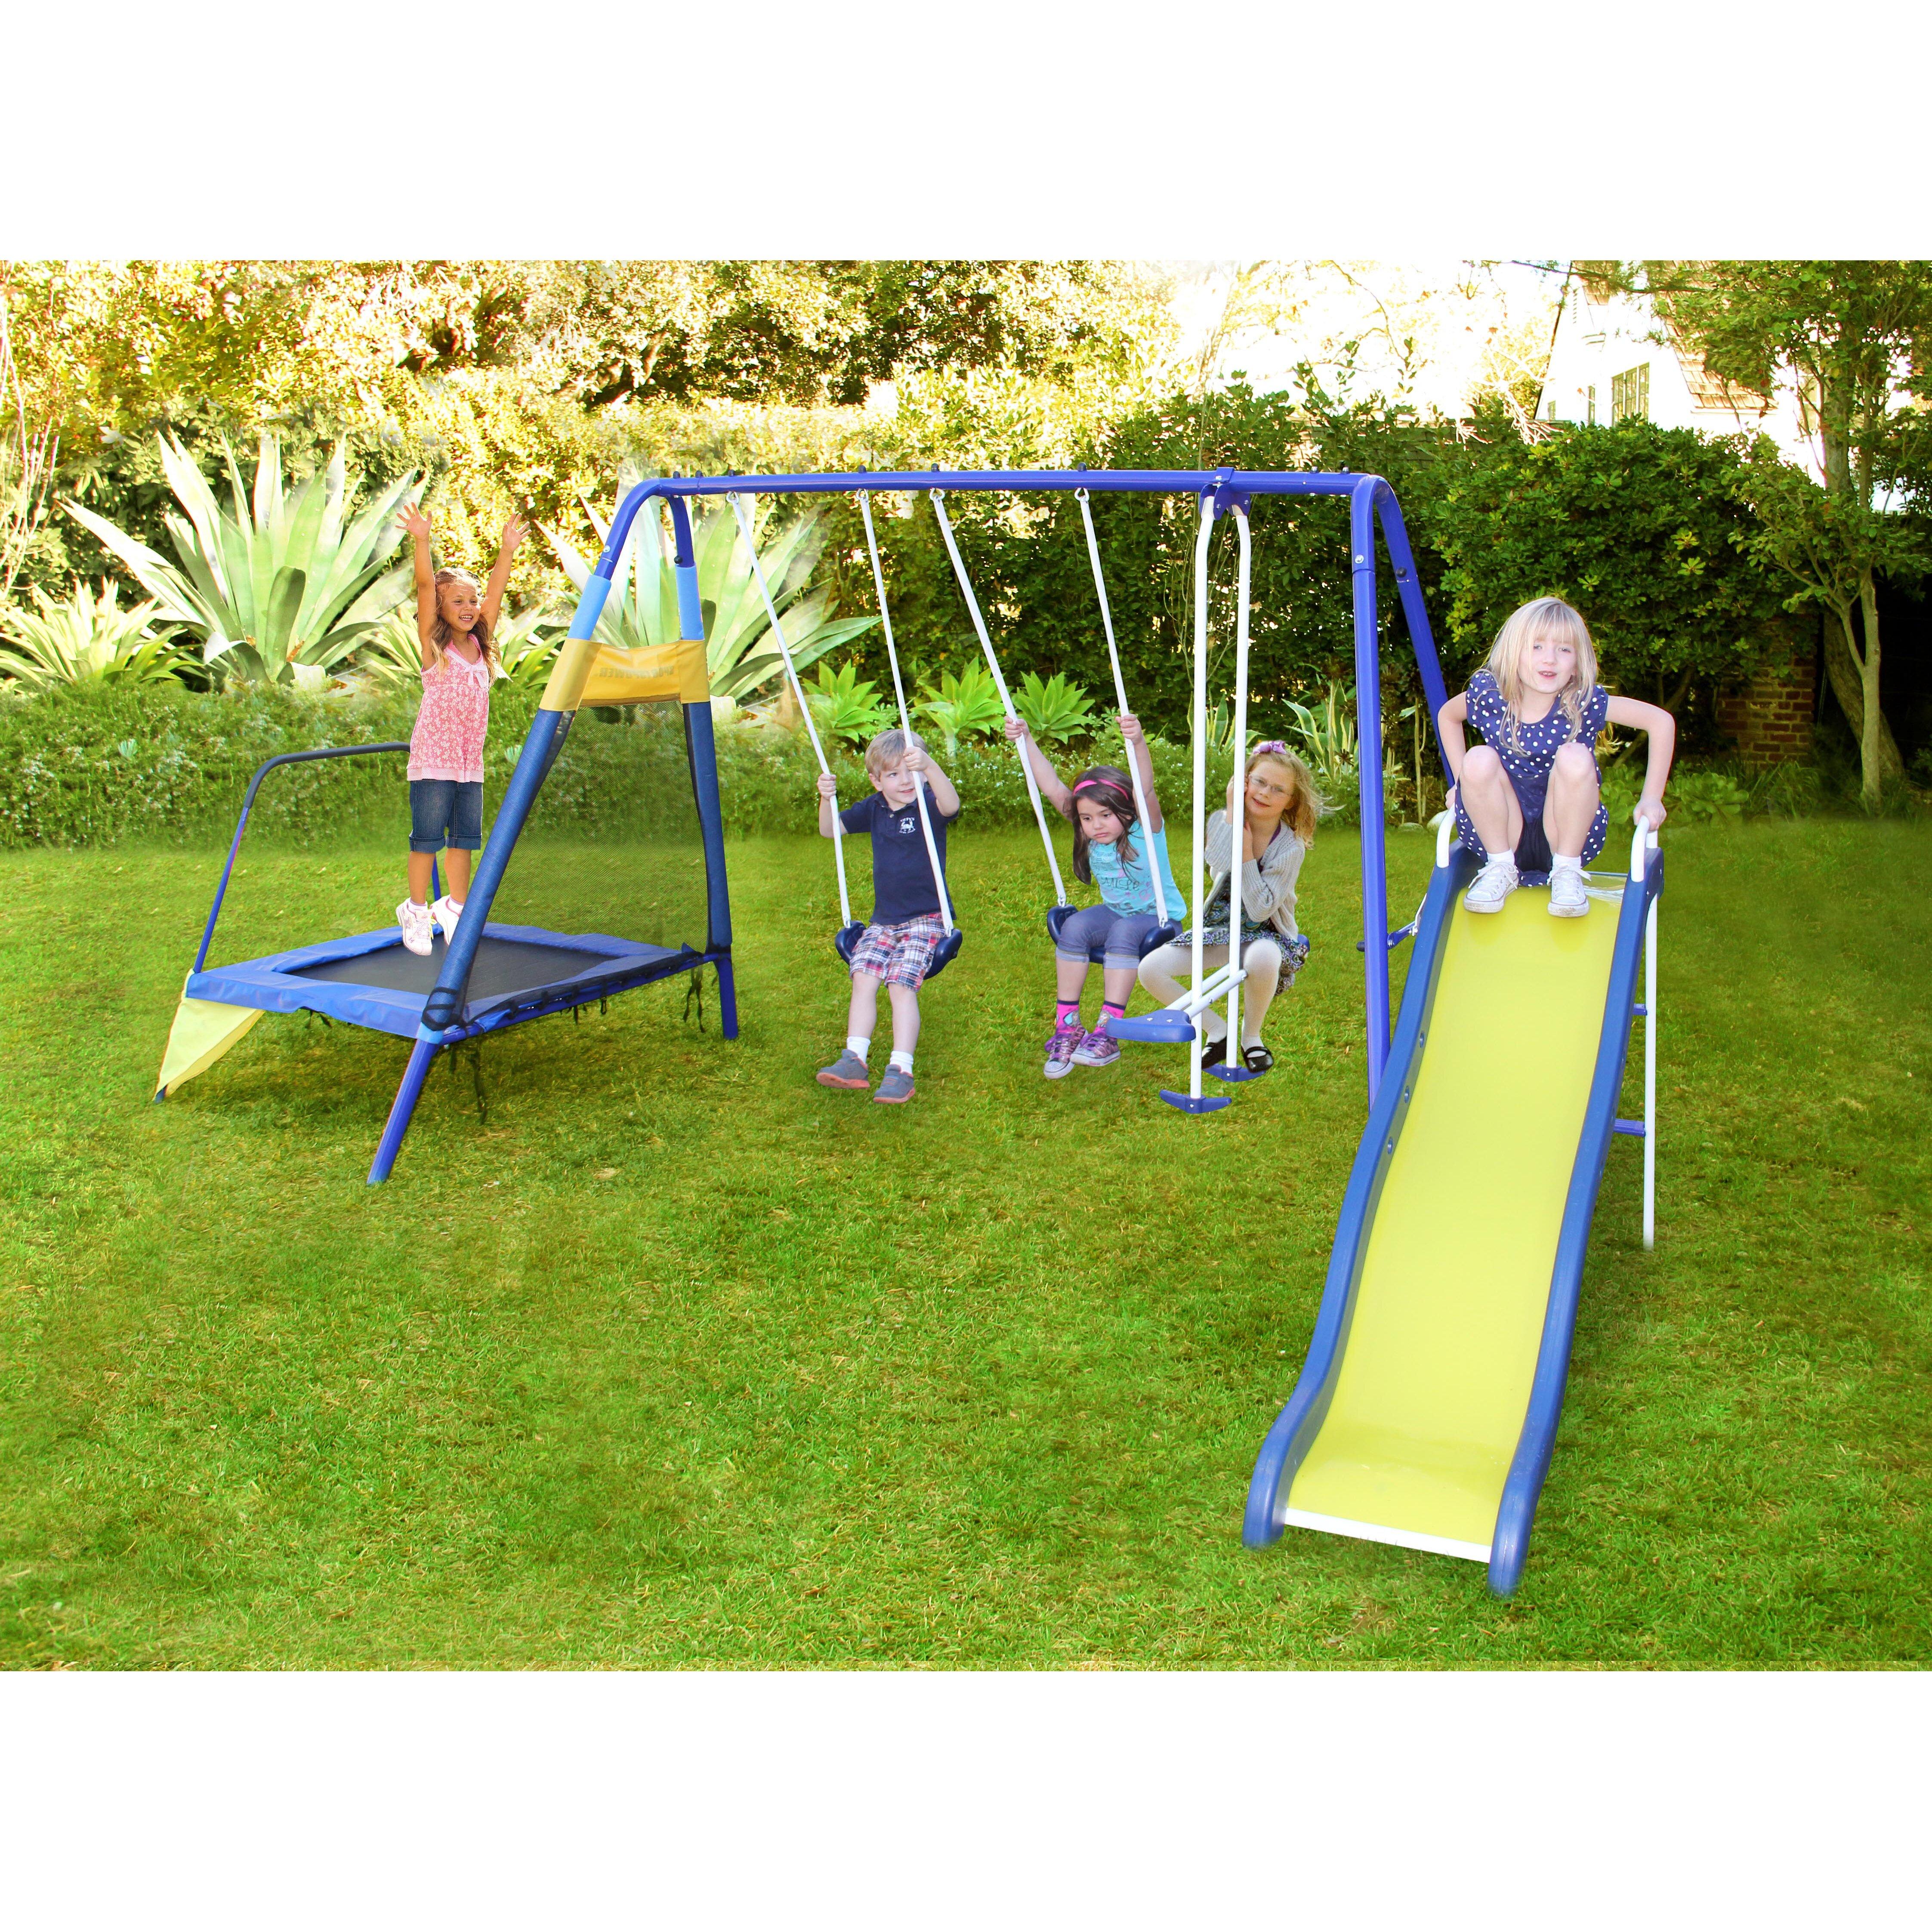 Natus Inc Almansor Metal Trampoline Slide And Swing Set